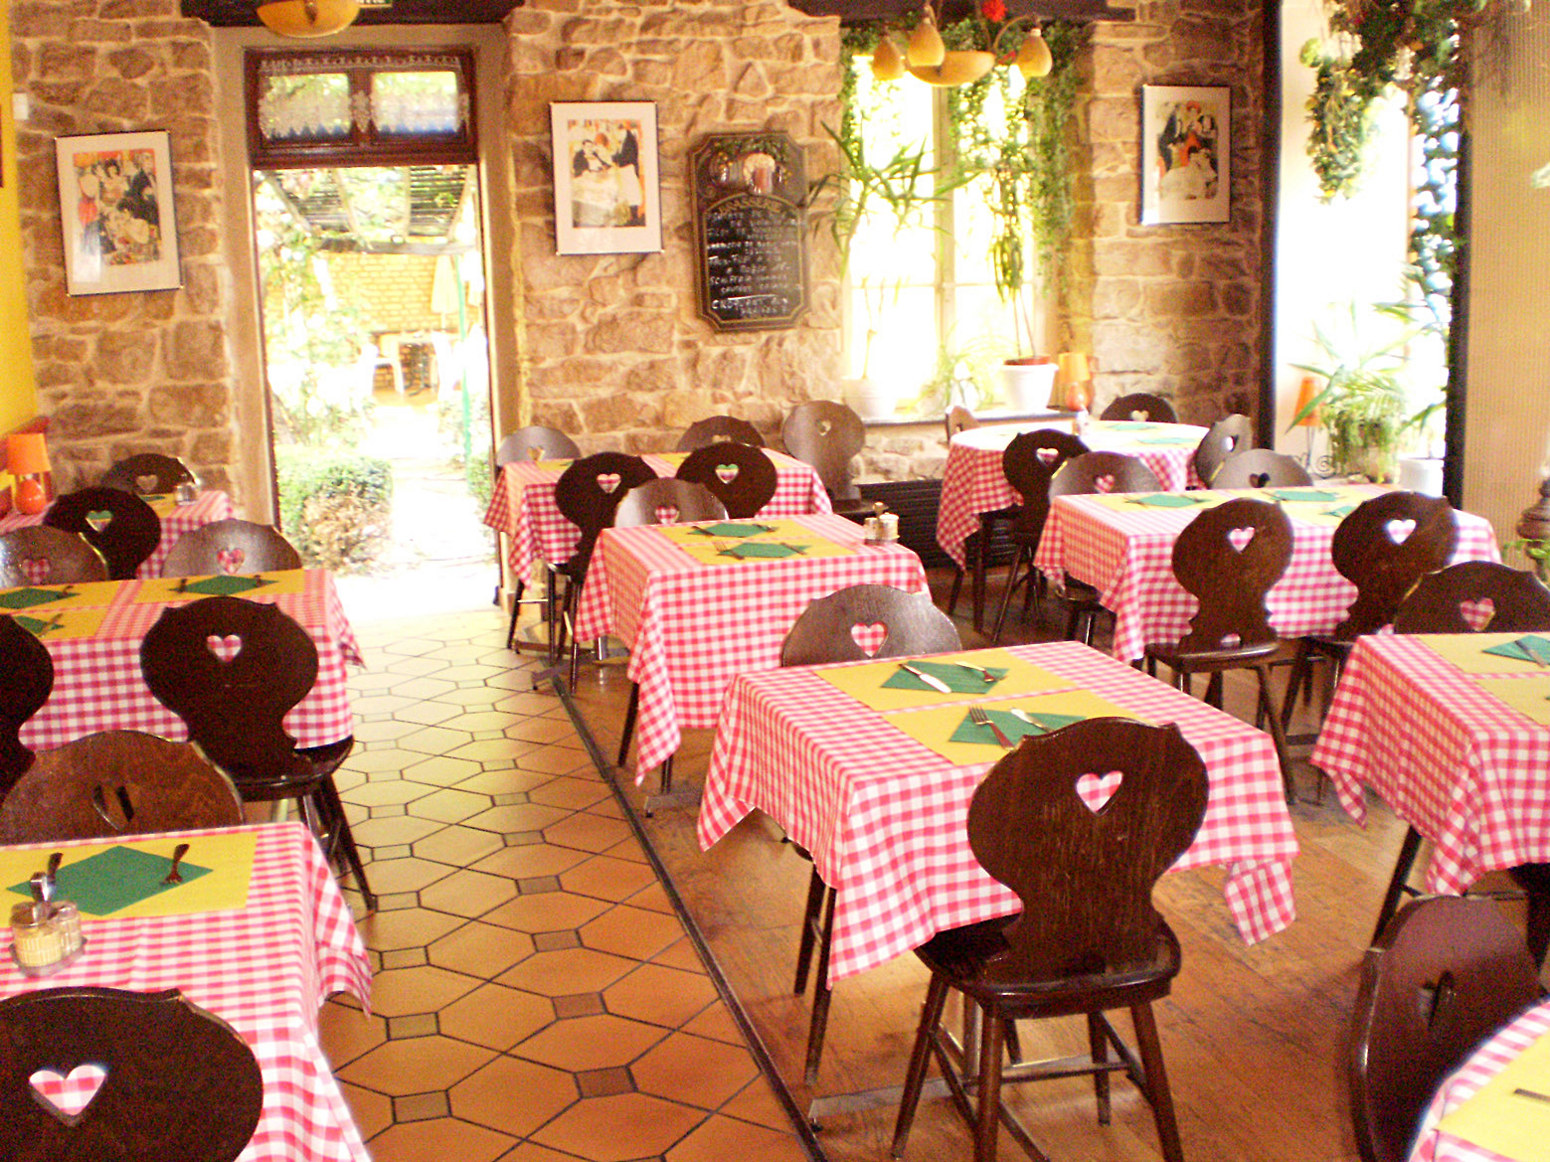 Winstub Au Cygne Colmar, Alsace http://www.winstublecygne.fr/